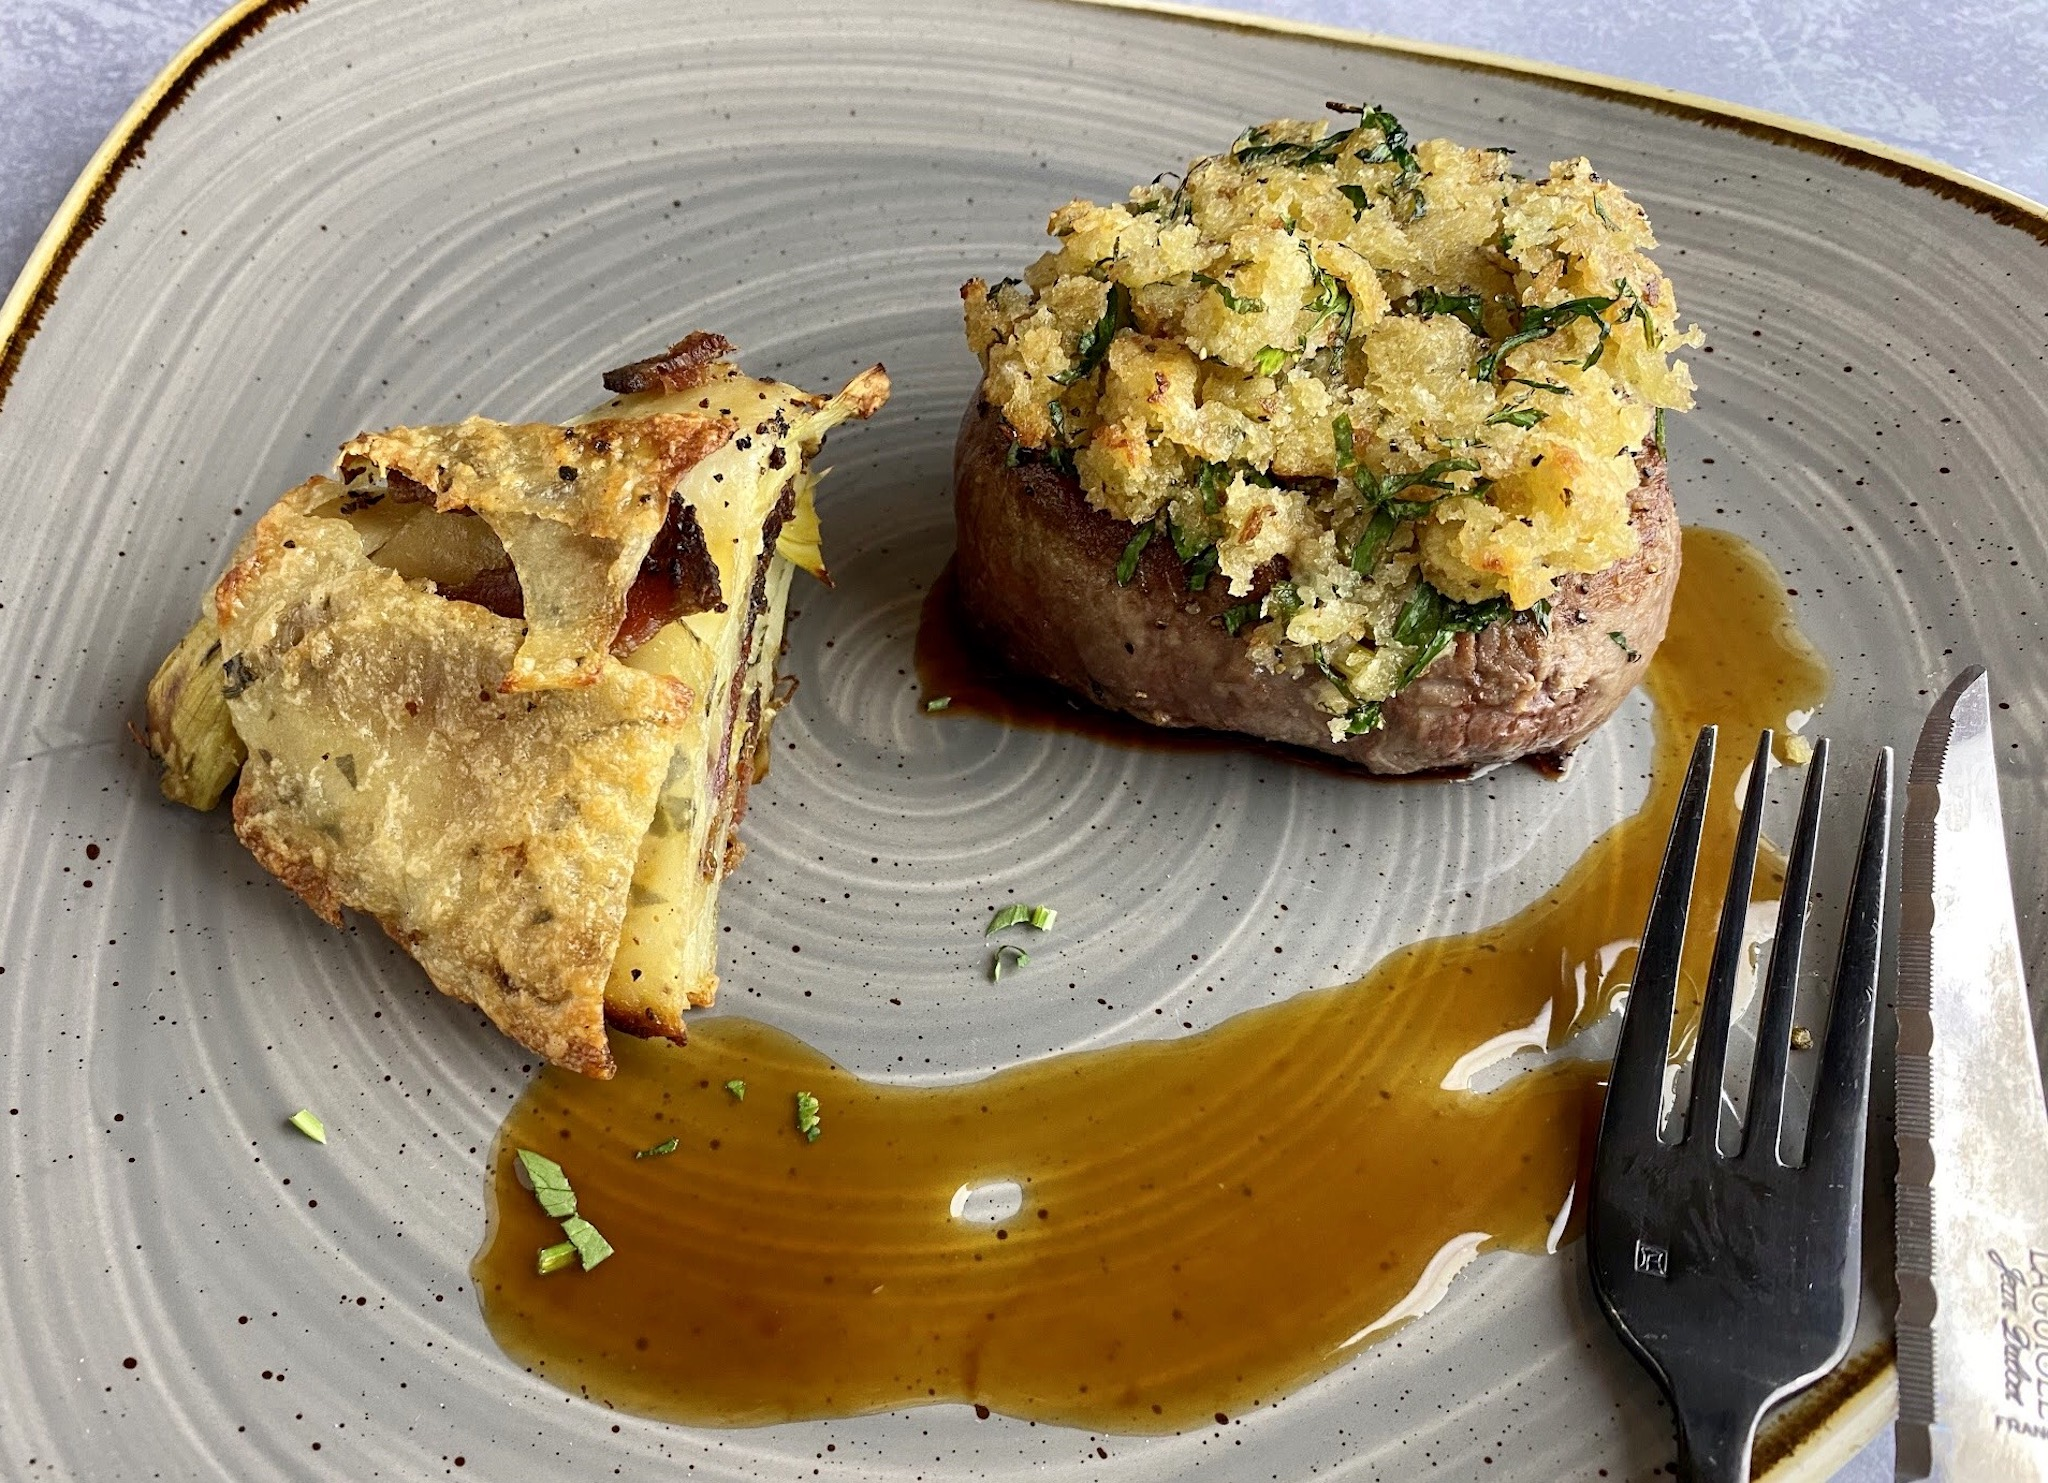 USDA Prime 8oz Firlet Mignon with an herbed breadcrumb crust, artichoke bacon and potato torte with demi glaze